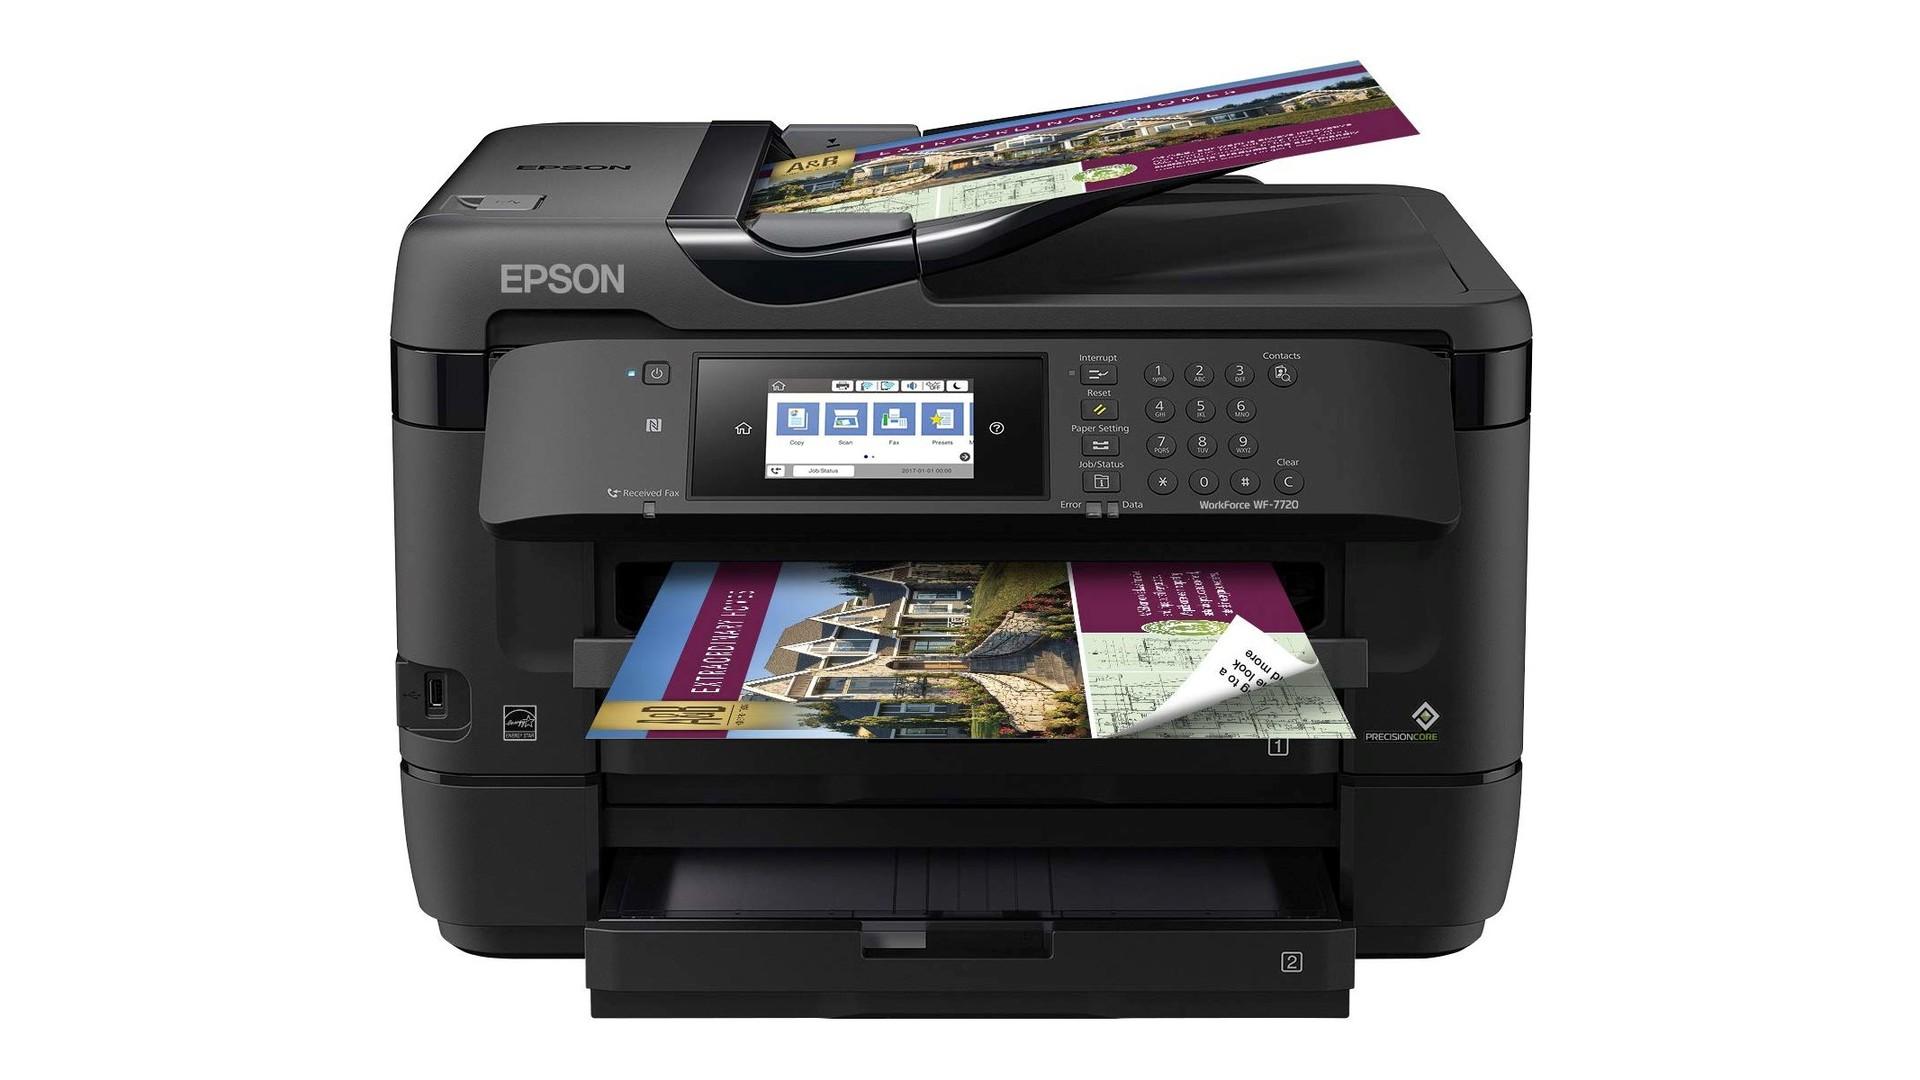 Epson WorkForce WF 7720 all in one printer